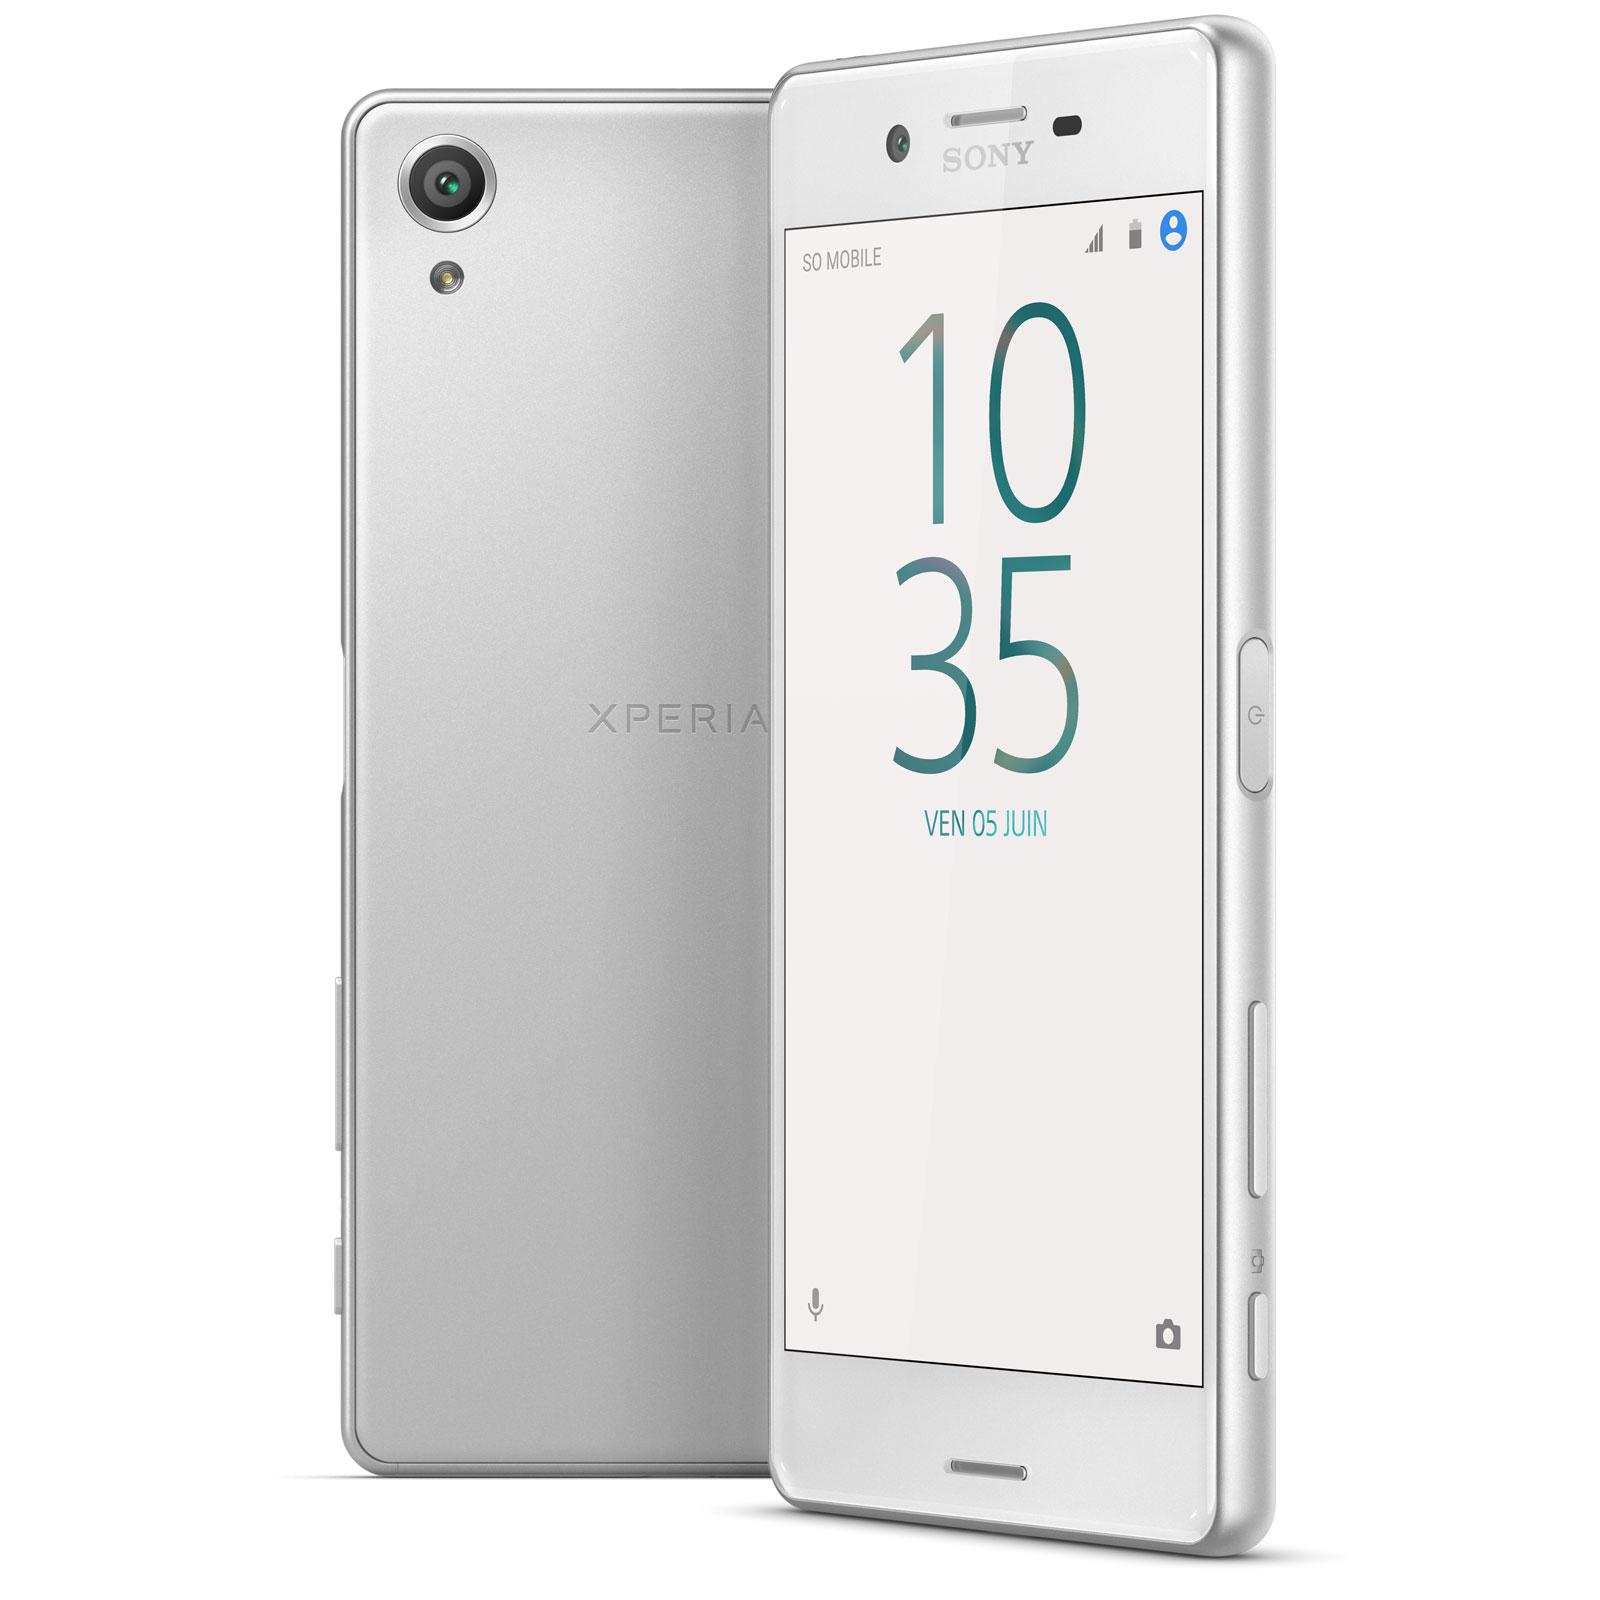 Sony xperia x dual sim 64 go blanc mobile smartphone for Ecran photo sony